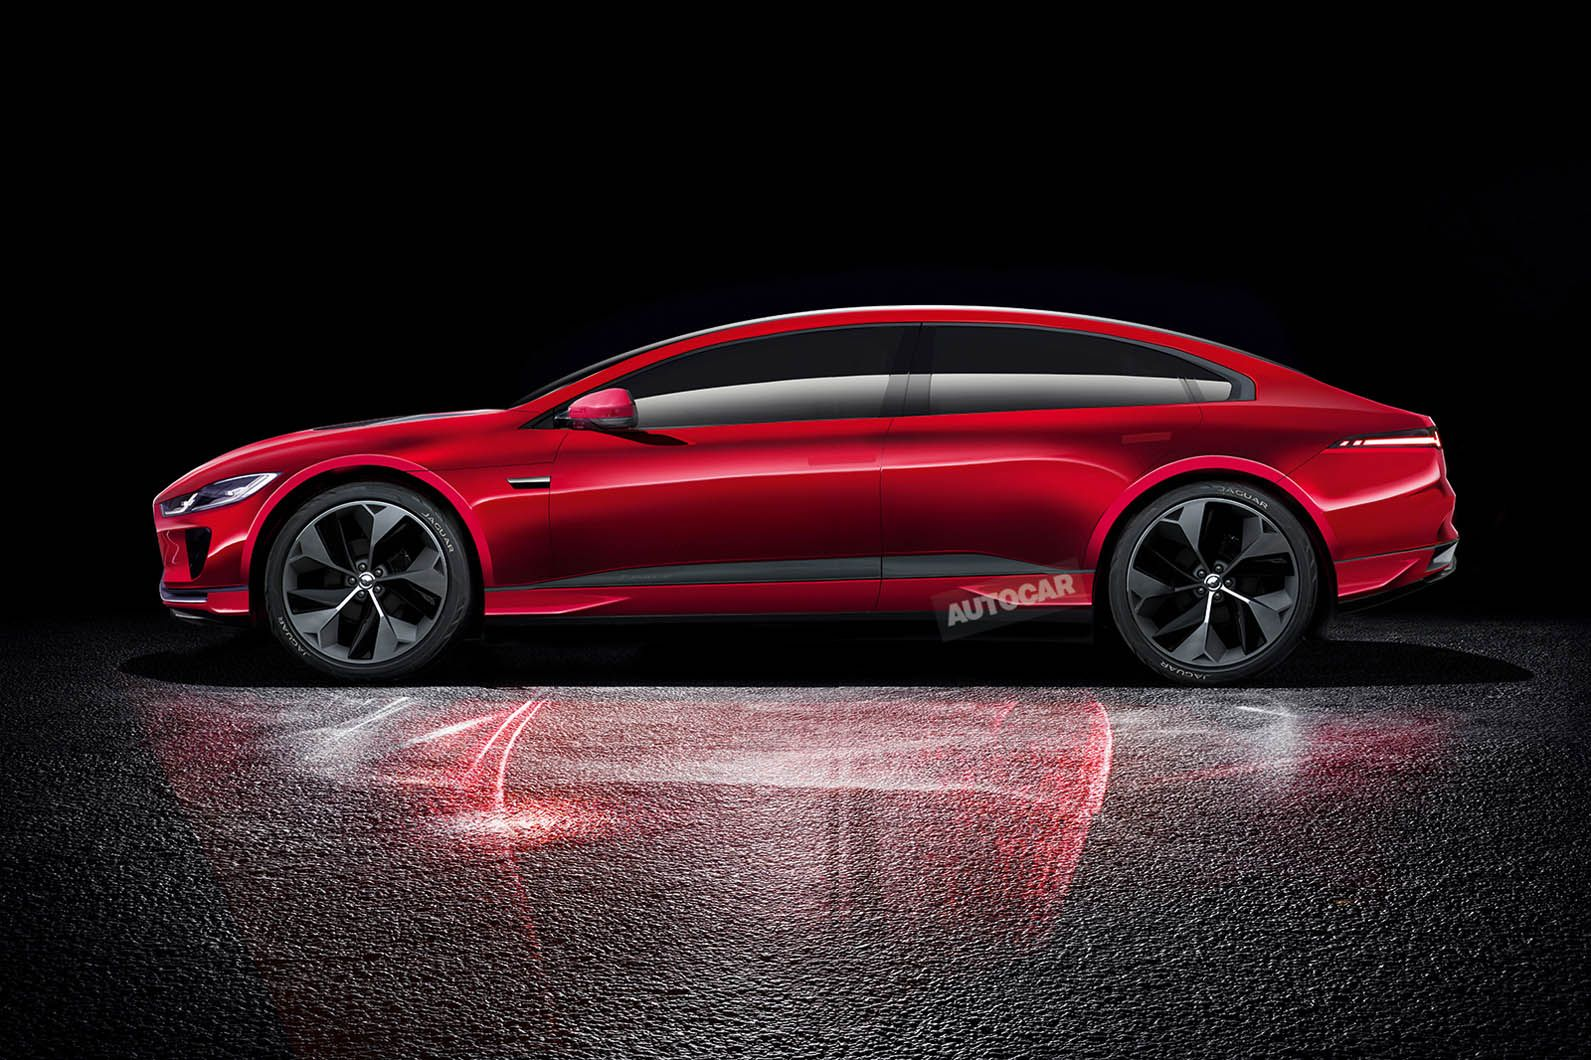 2019 Jaguar XJ to be reborn as high tech electric flagship